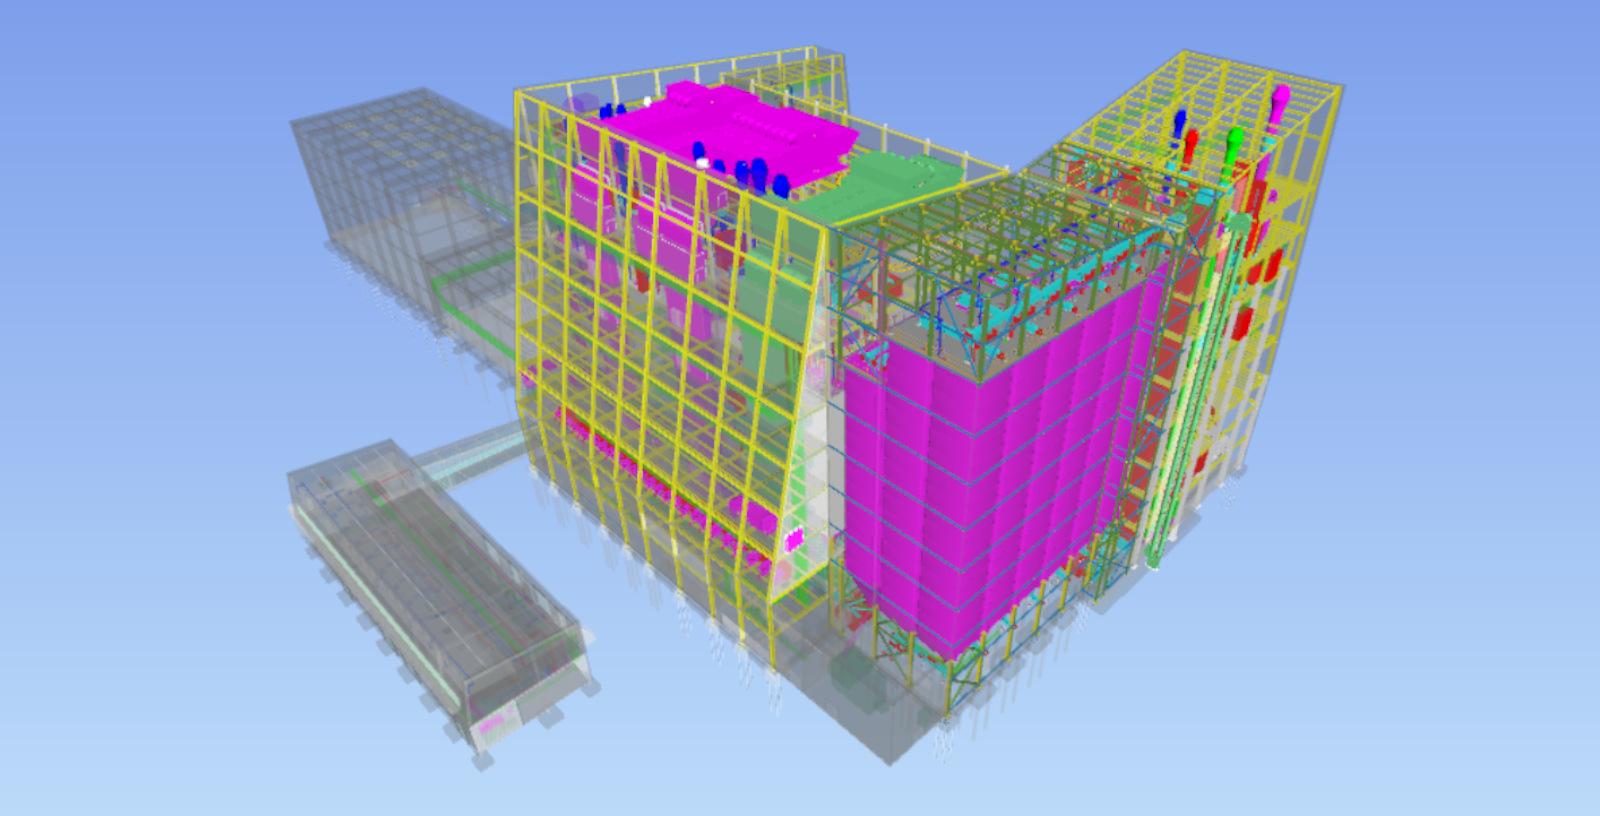 Oats_Manufacturing_Plant_Harivenasa_IDOM_01